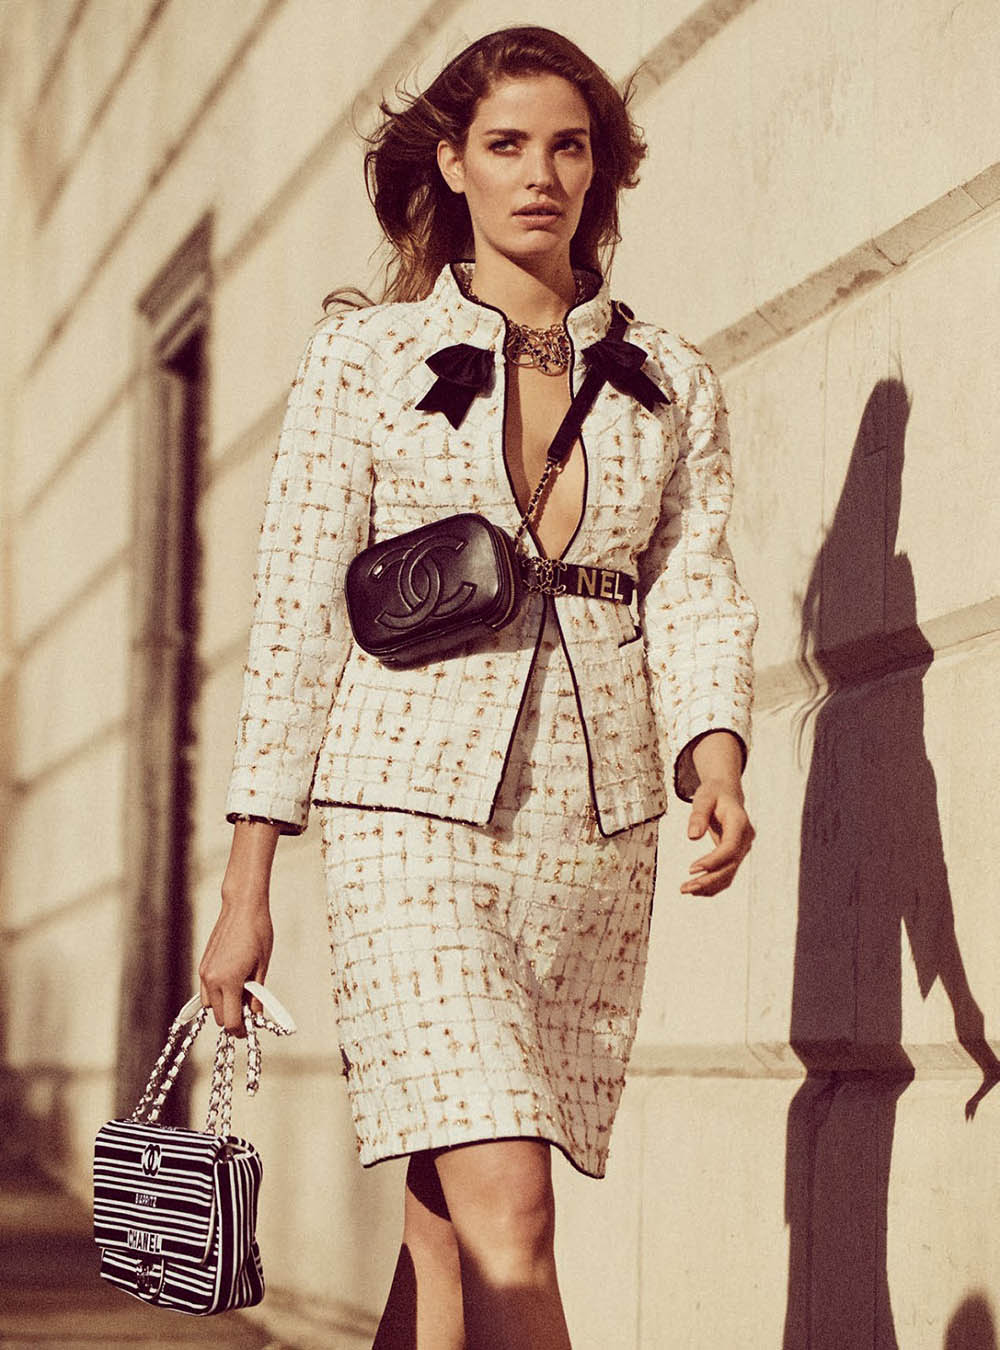 Alisa-Ahmann-by-Regan-Cameron-for-Harper's-Bazaar-UK-March-2019-4.jpg